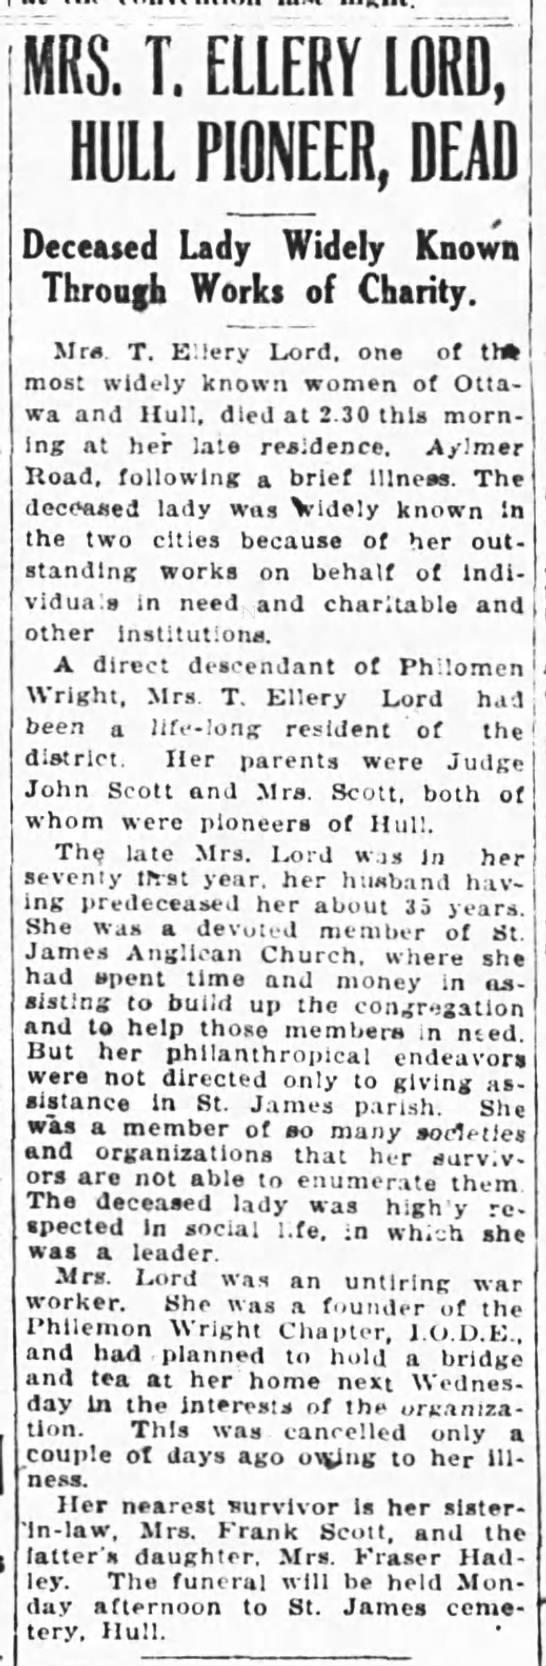 LORD_1921(Oct22)_MrsTE-obit-OttJ - MRS. T. ELLERY LORD, HULL PIONEER, DEAD...